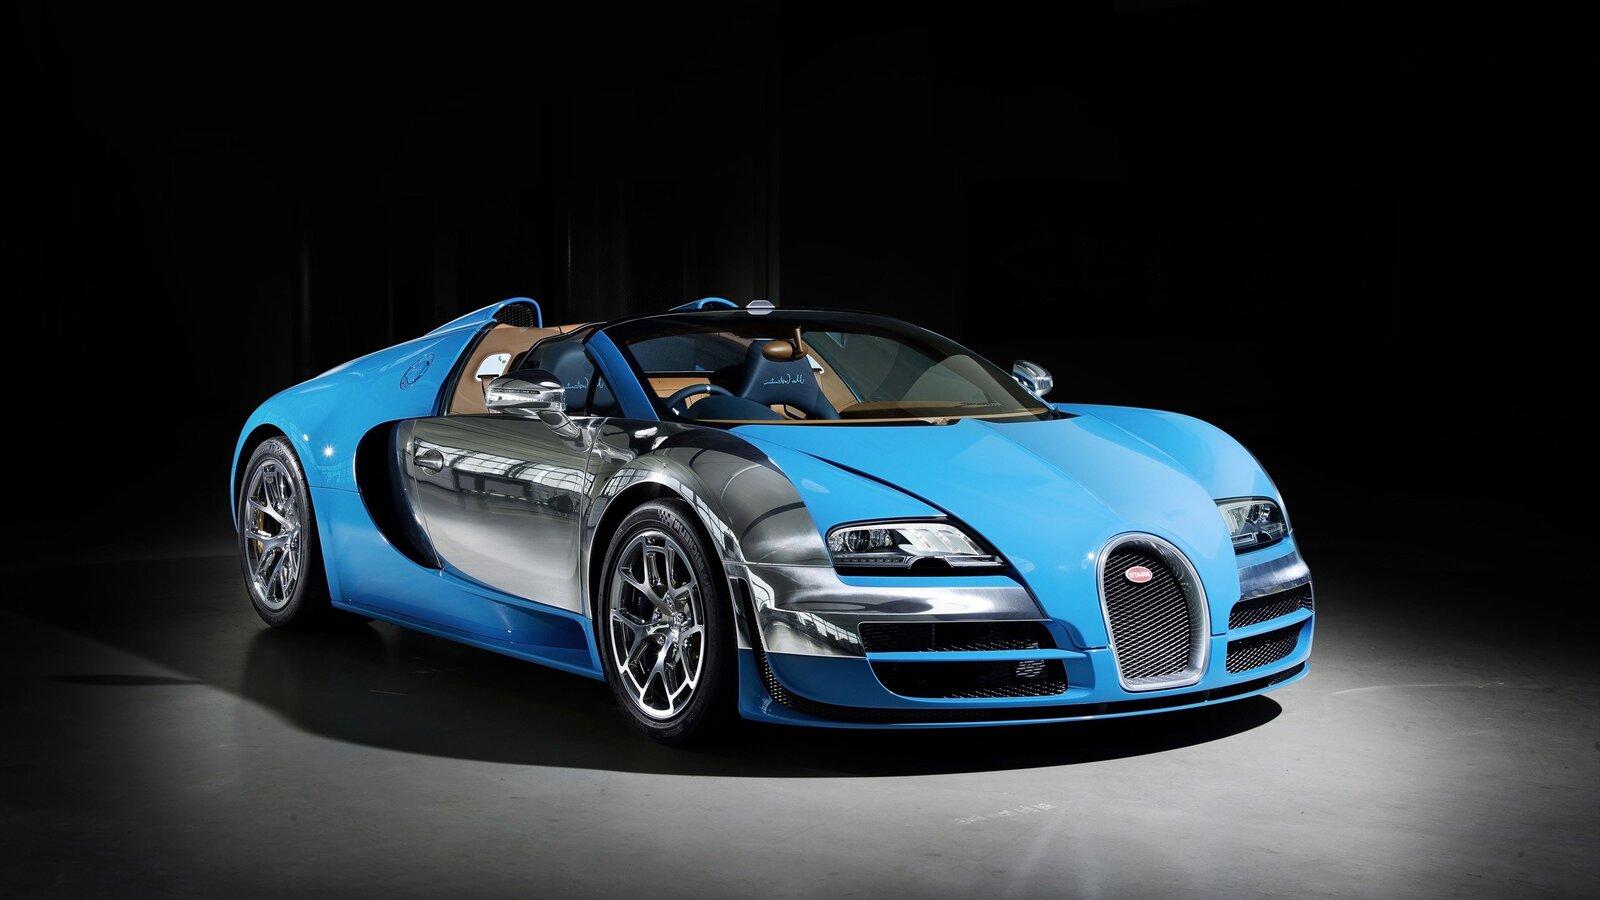 1600x900 Bugatti Veyron Grand Sport Vitesse Hd 1600x900 Resolution